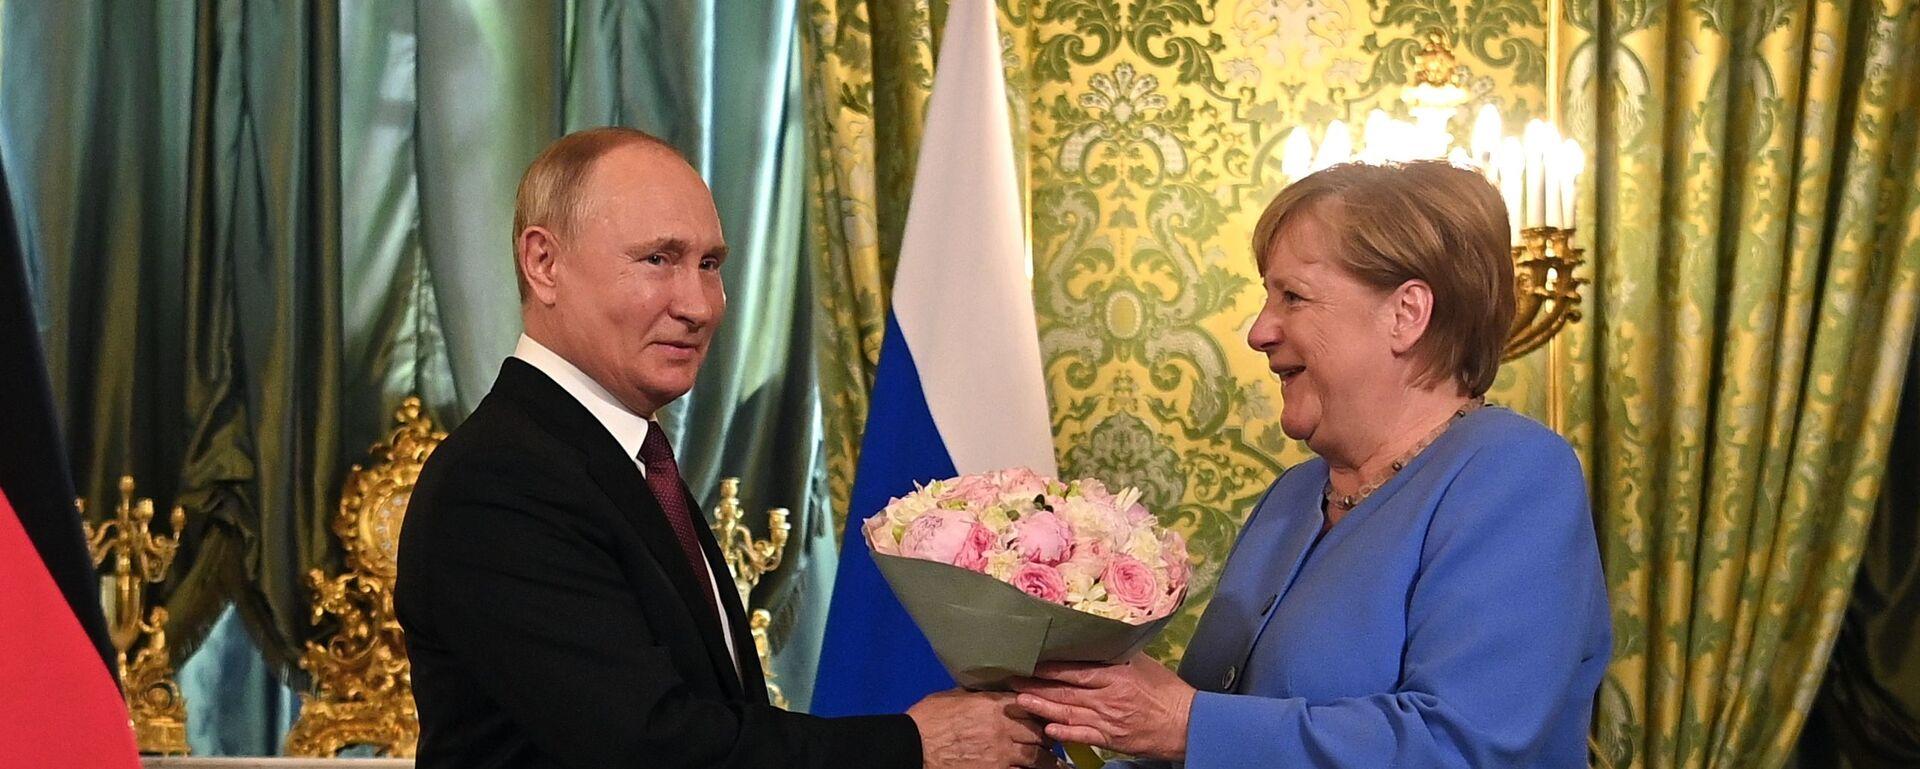 Władimir Putin i Angela Merkel - Sputnik Polska, 1920, 20.08.2021